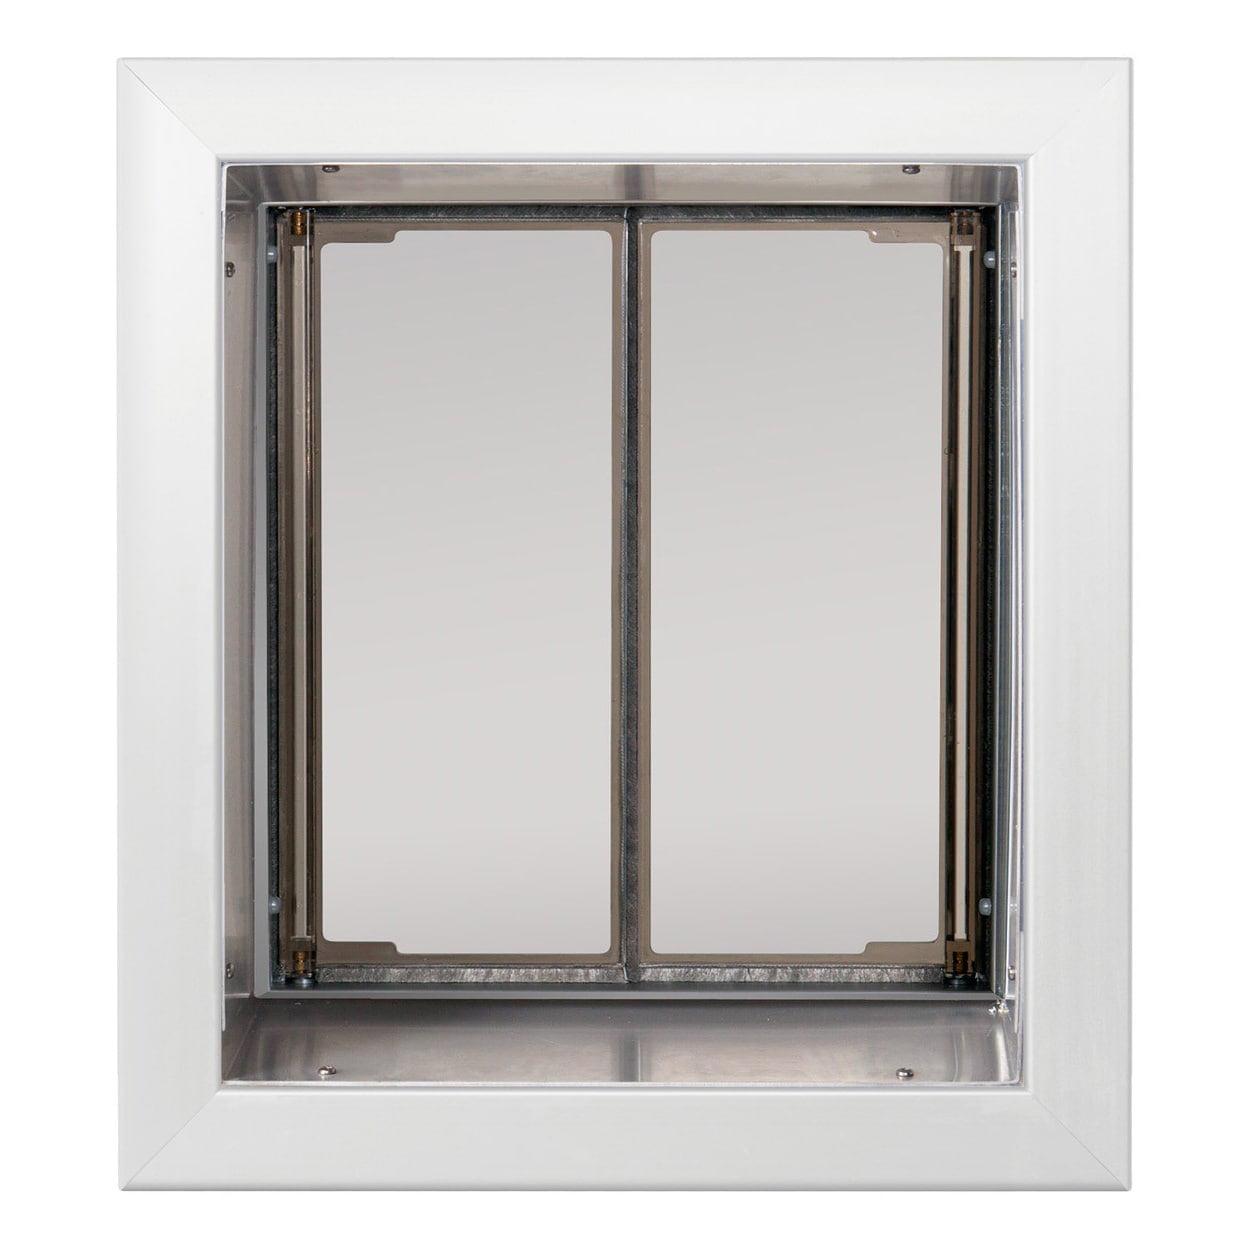 PD USA INC PlexiDor Performance Pet Door Medium Wall Mount